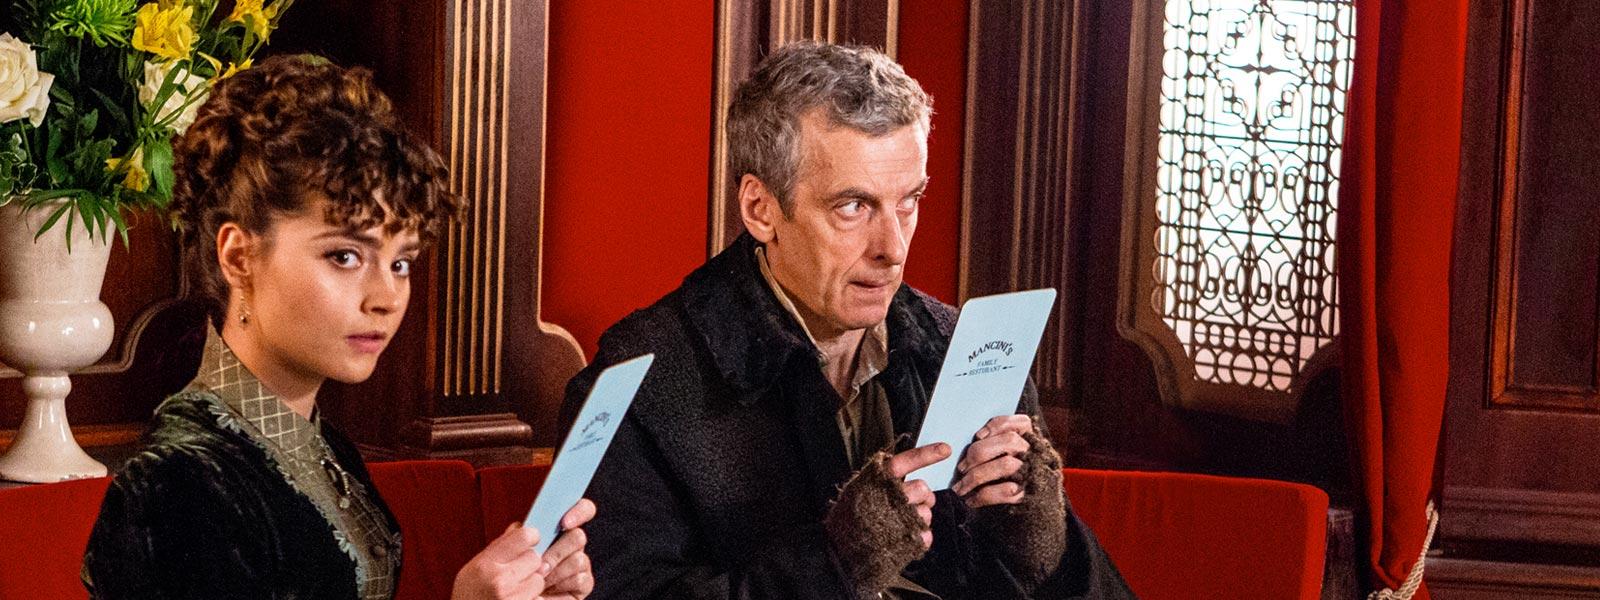 doctor-who-episode-801-doctor-capaldi-clara-coleman-800×600